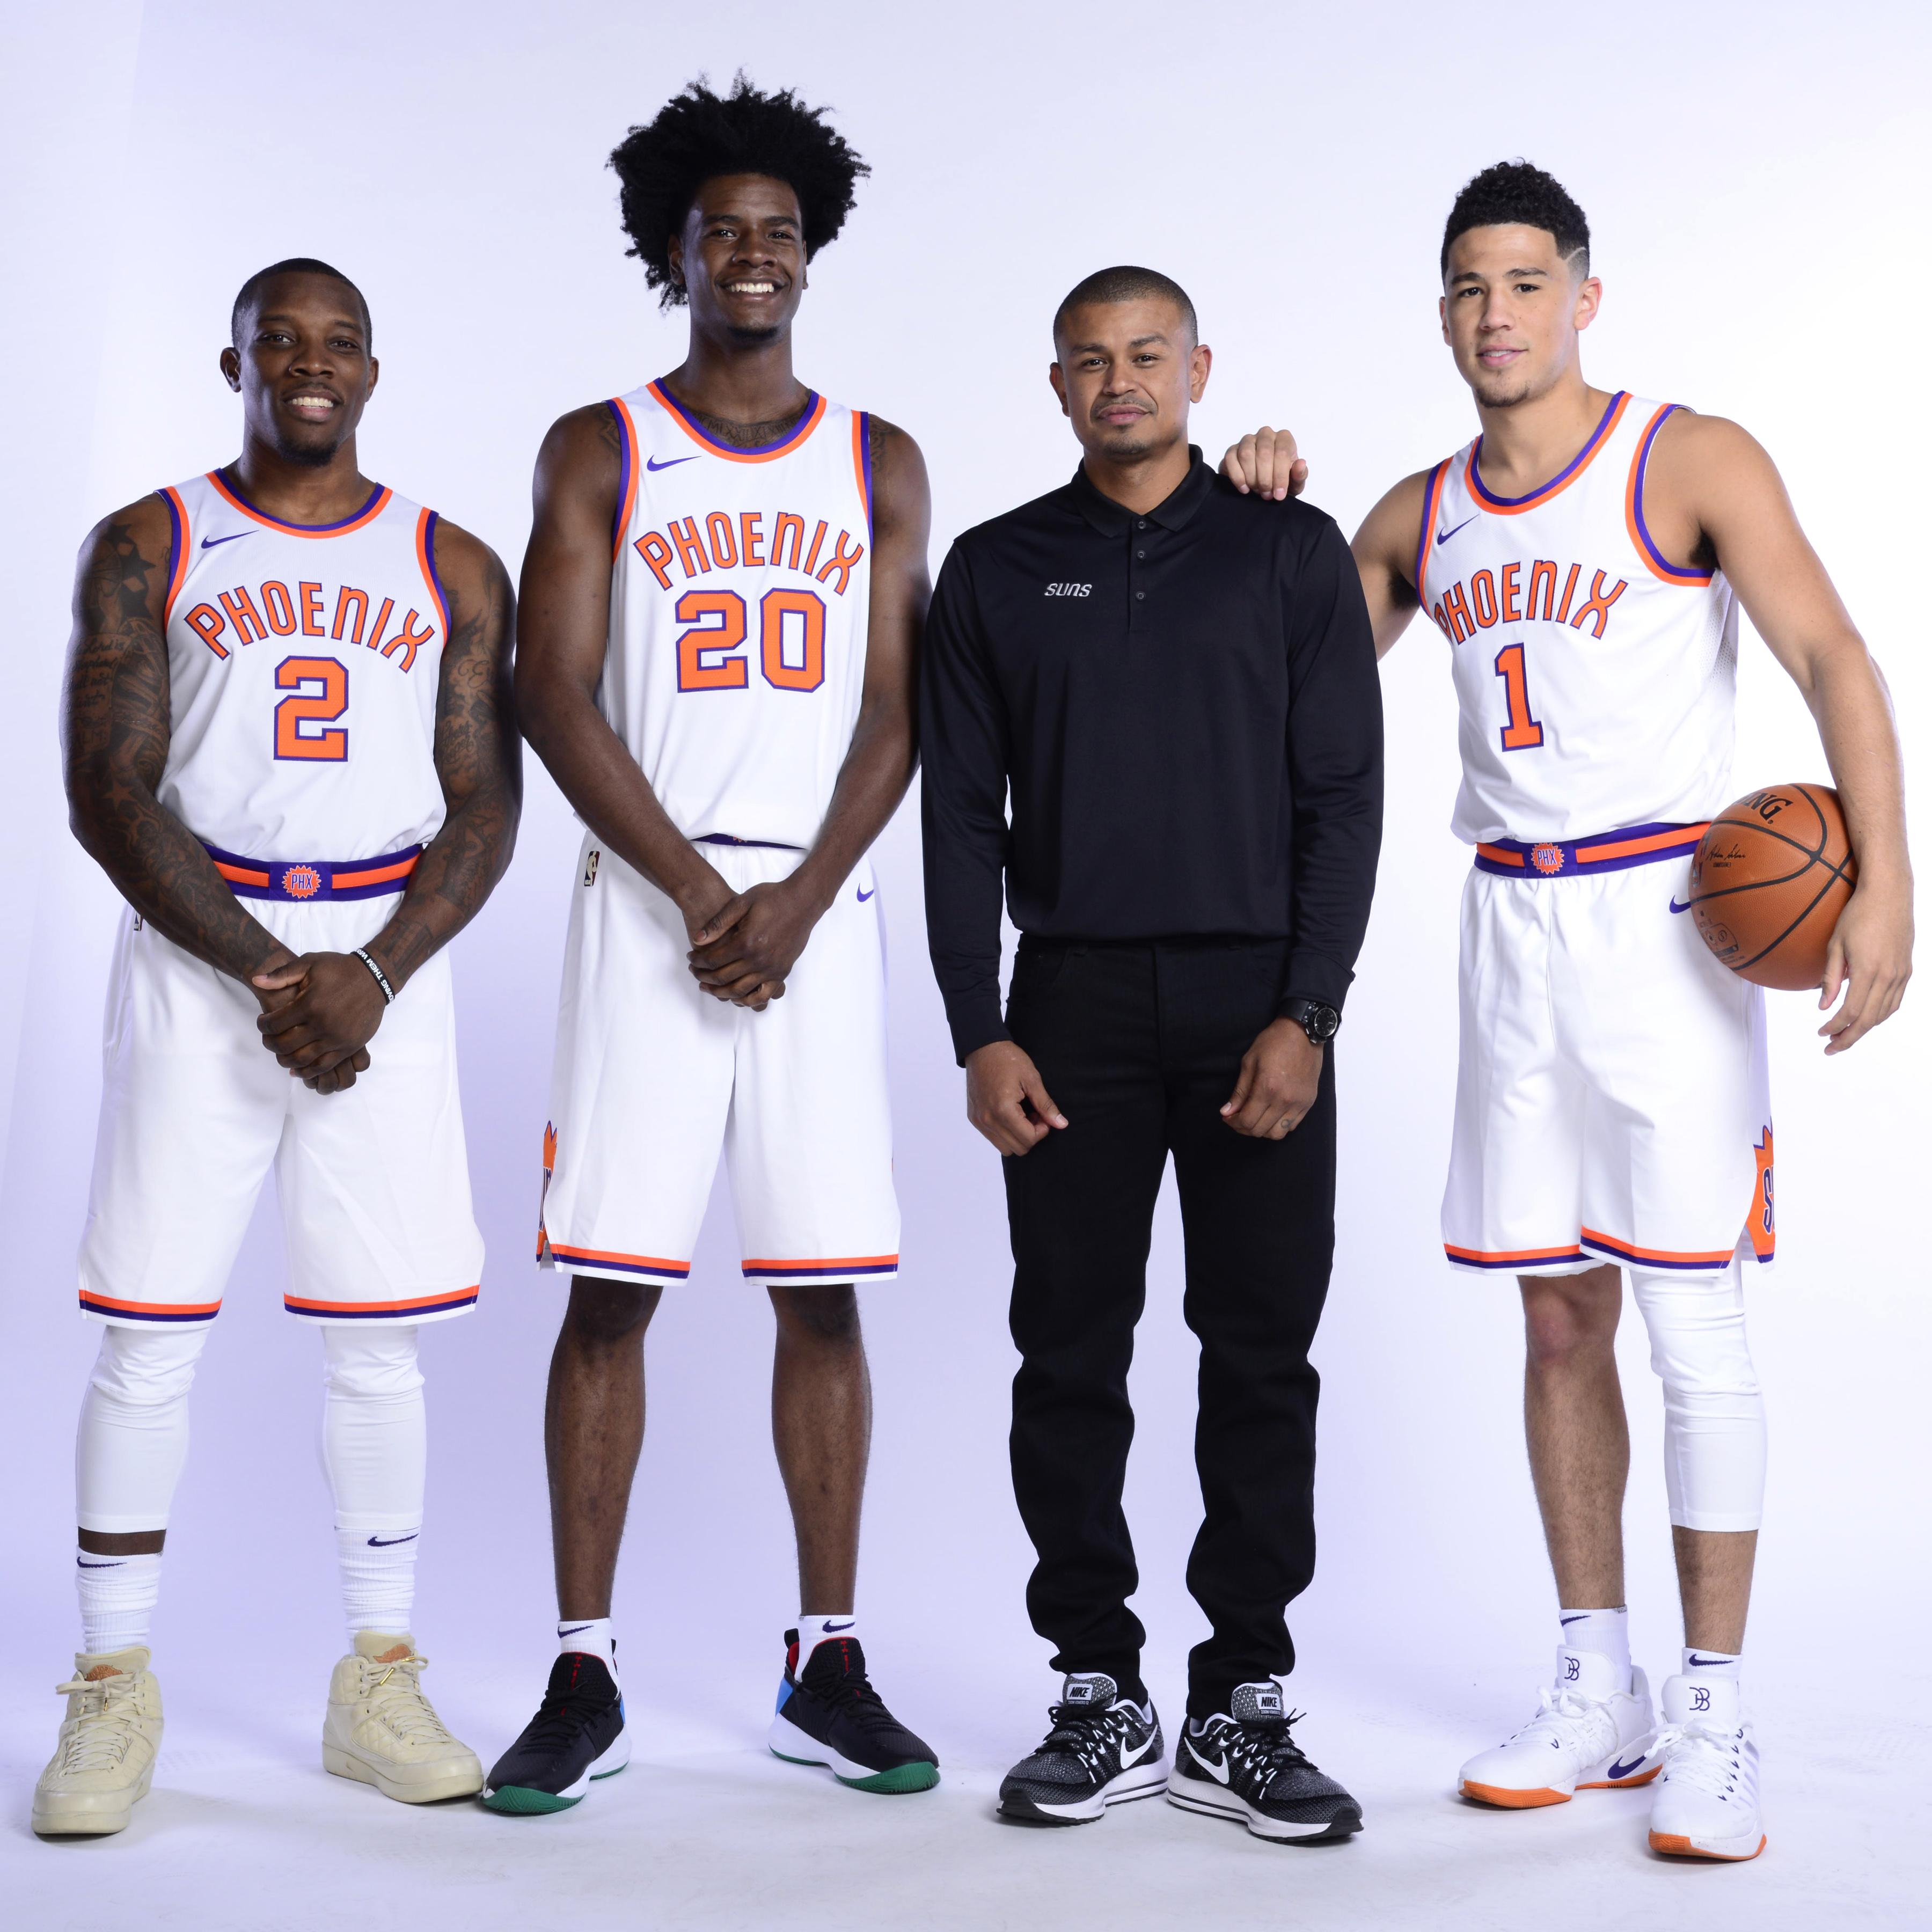 Phoenix Suns. Fotografía del Media Day de los Phoenix Suns 2017-18.